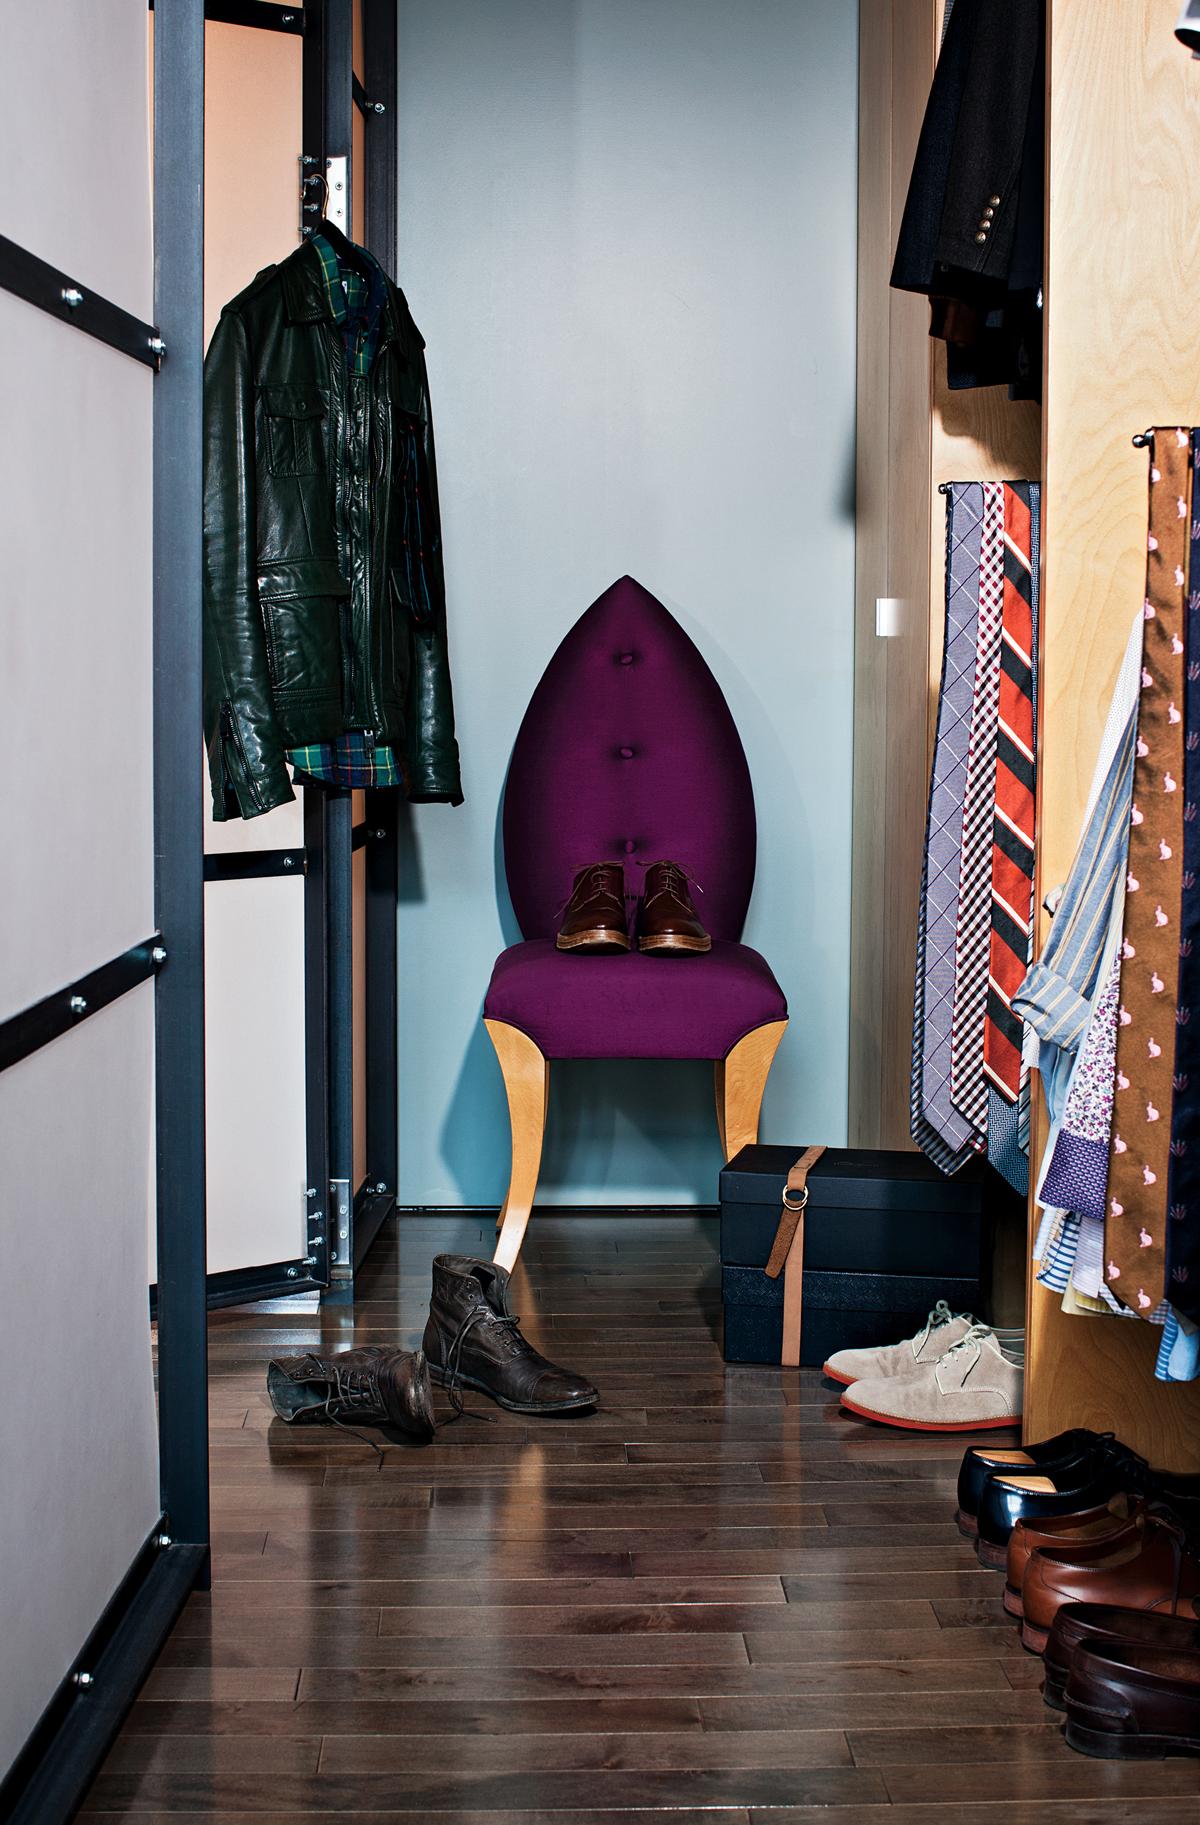 gary-ritacco-uniform-sowa-apartment-3